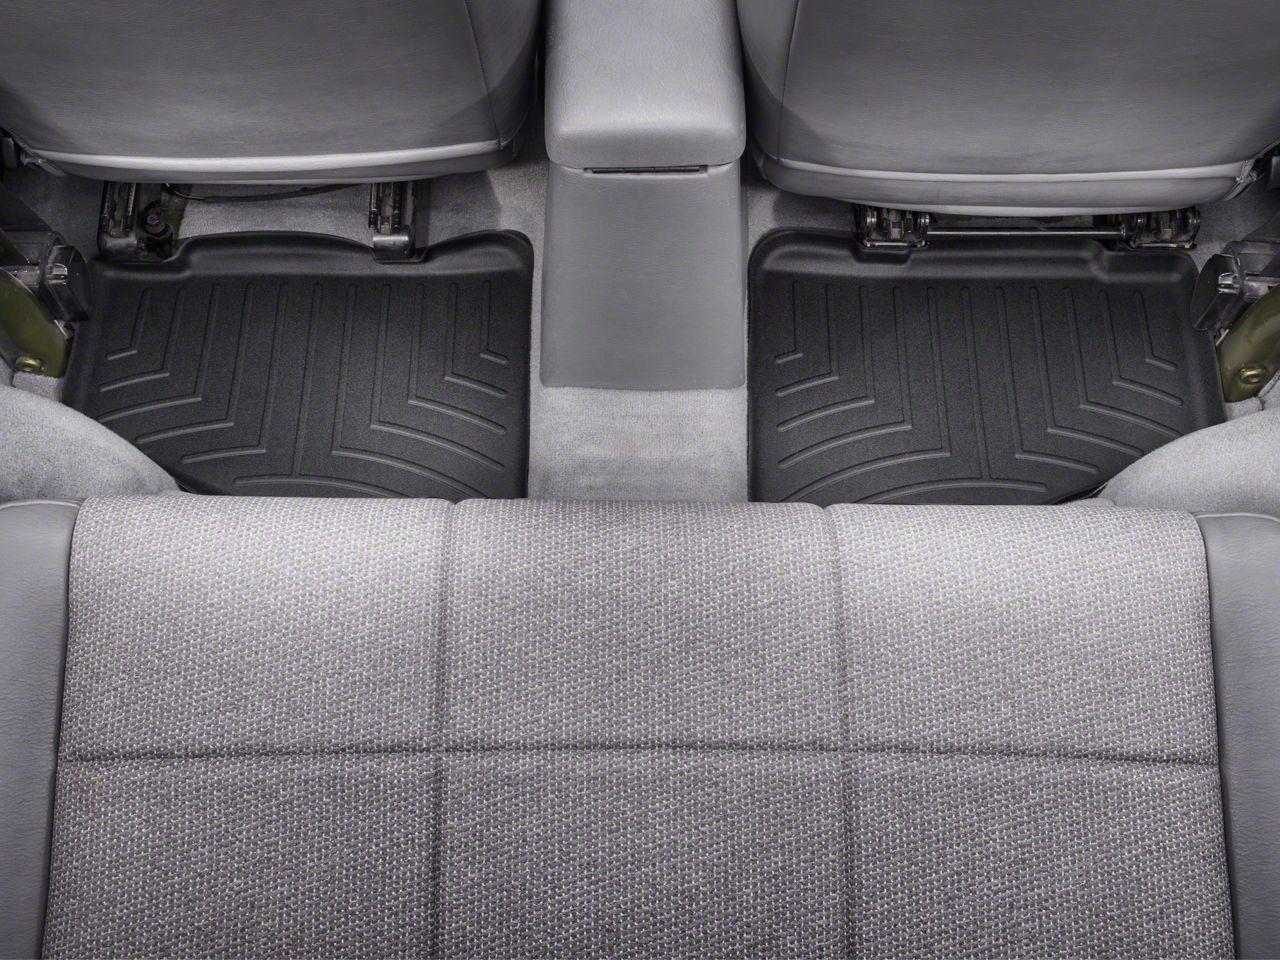 Weathertech DigitalFit Rear Floor Liner - Black (97-06 Jeep Wrangler TJ)